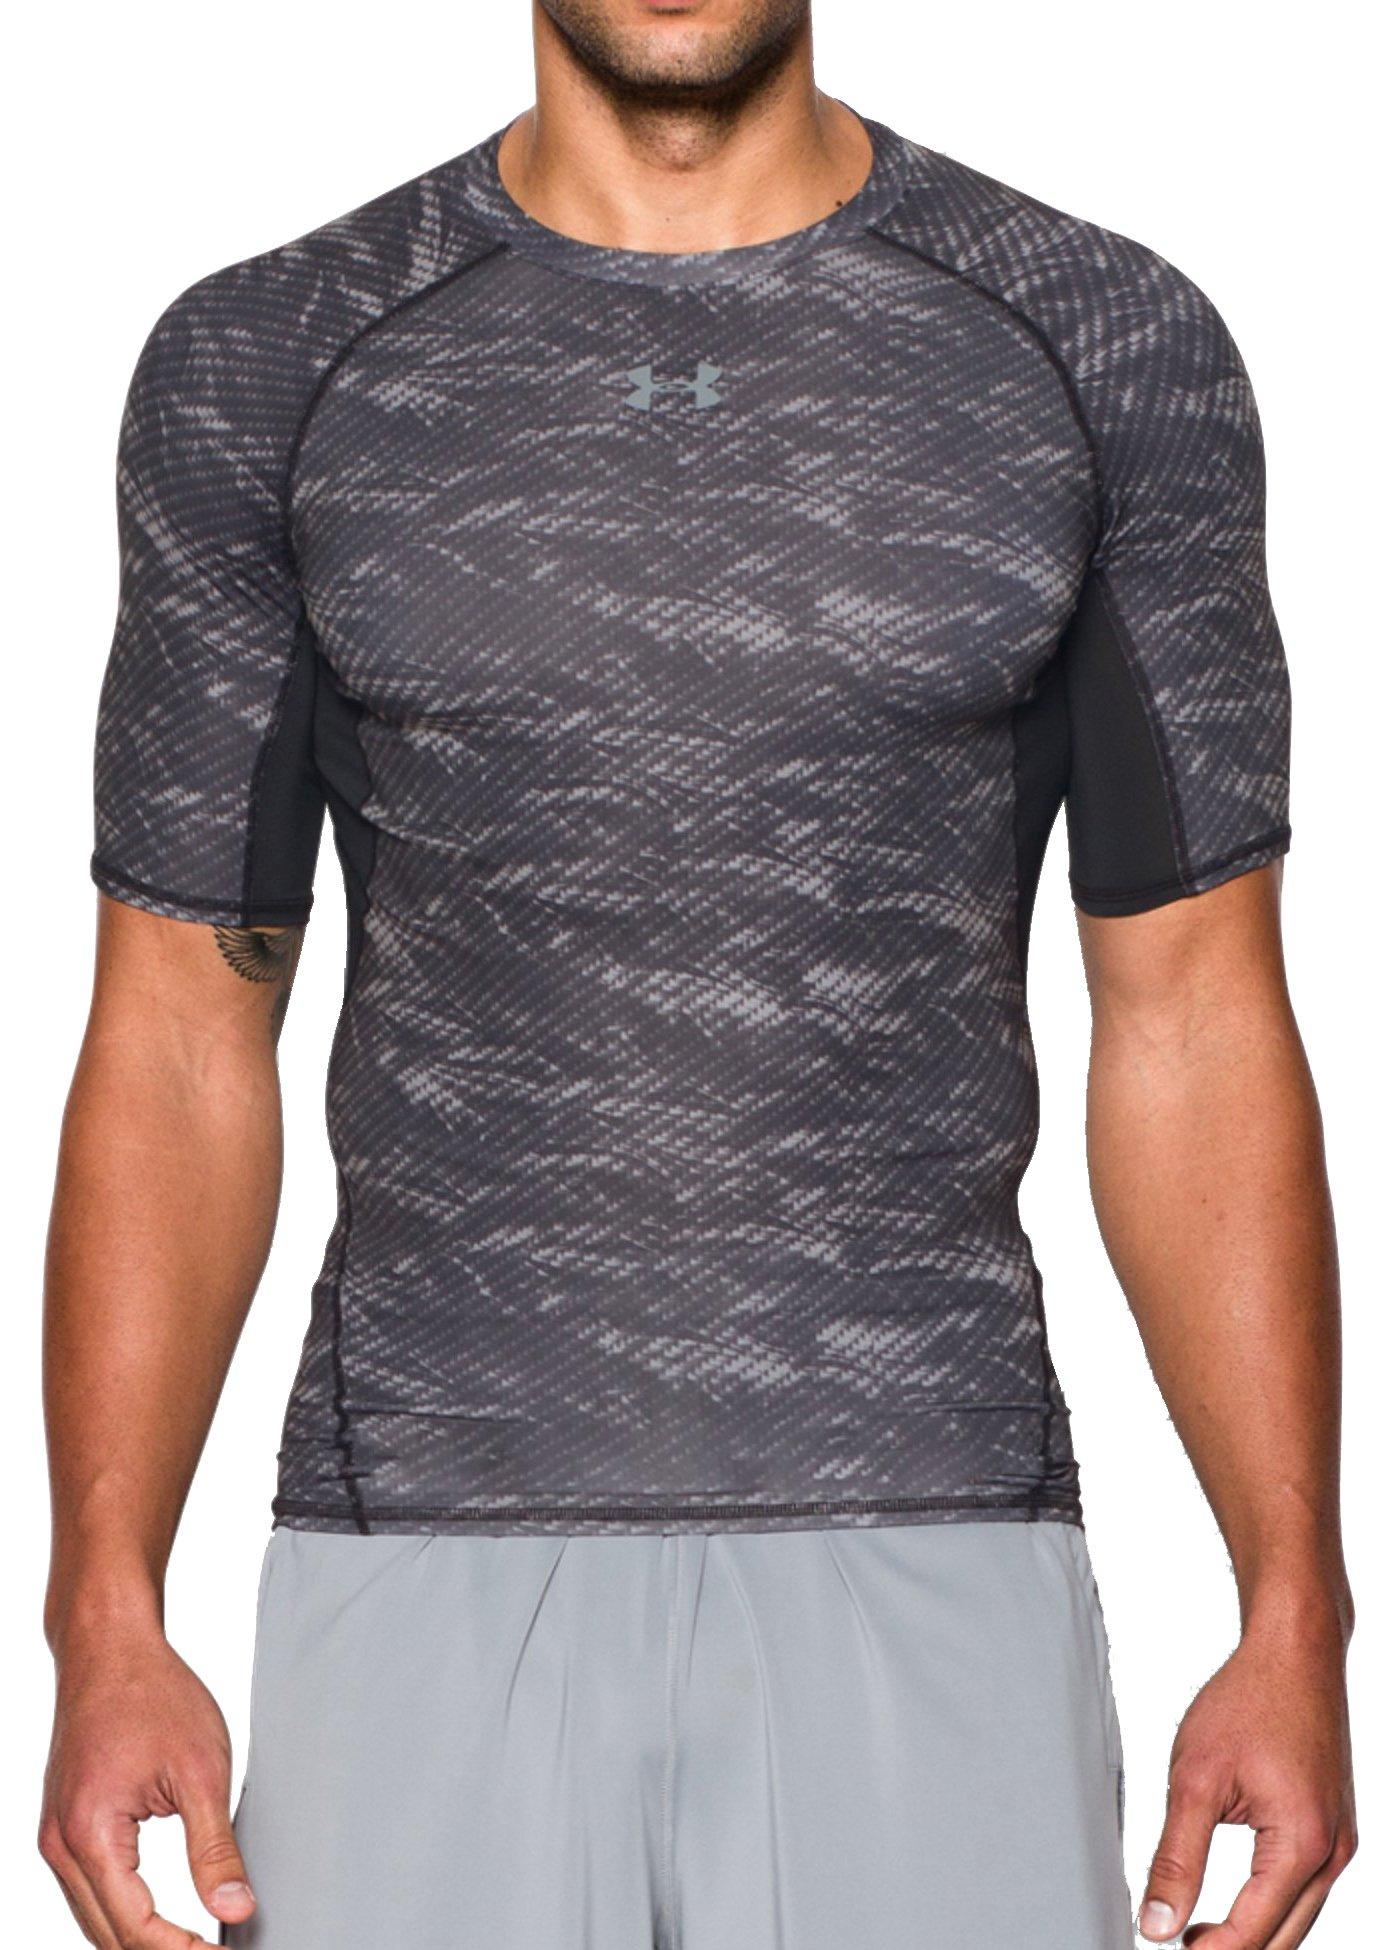 Kompresní triko Under Armour HG Printed